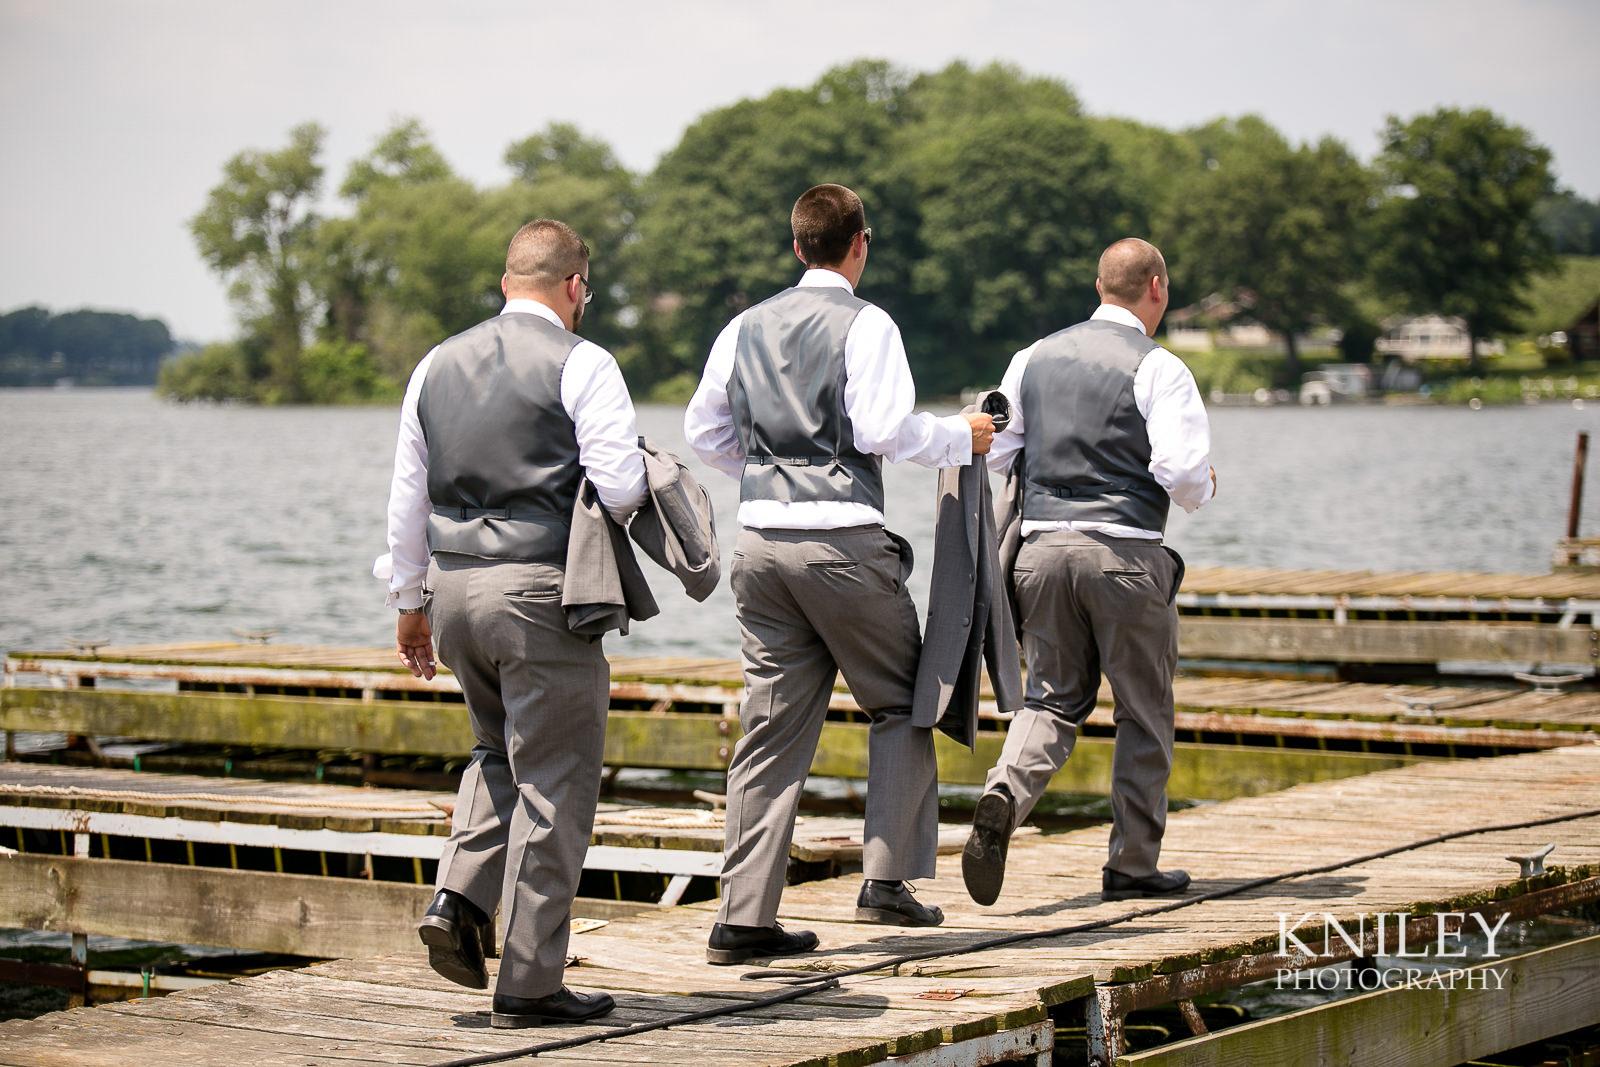 038 - Oak Park Resort Marina Wedding Pictures - Sodus Bay NY -IMG_1328.jpg